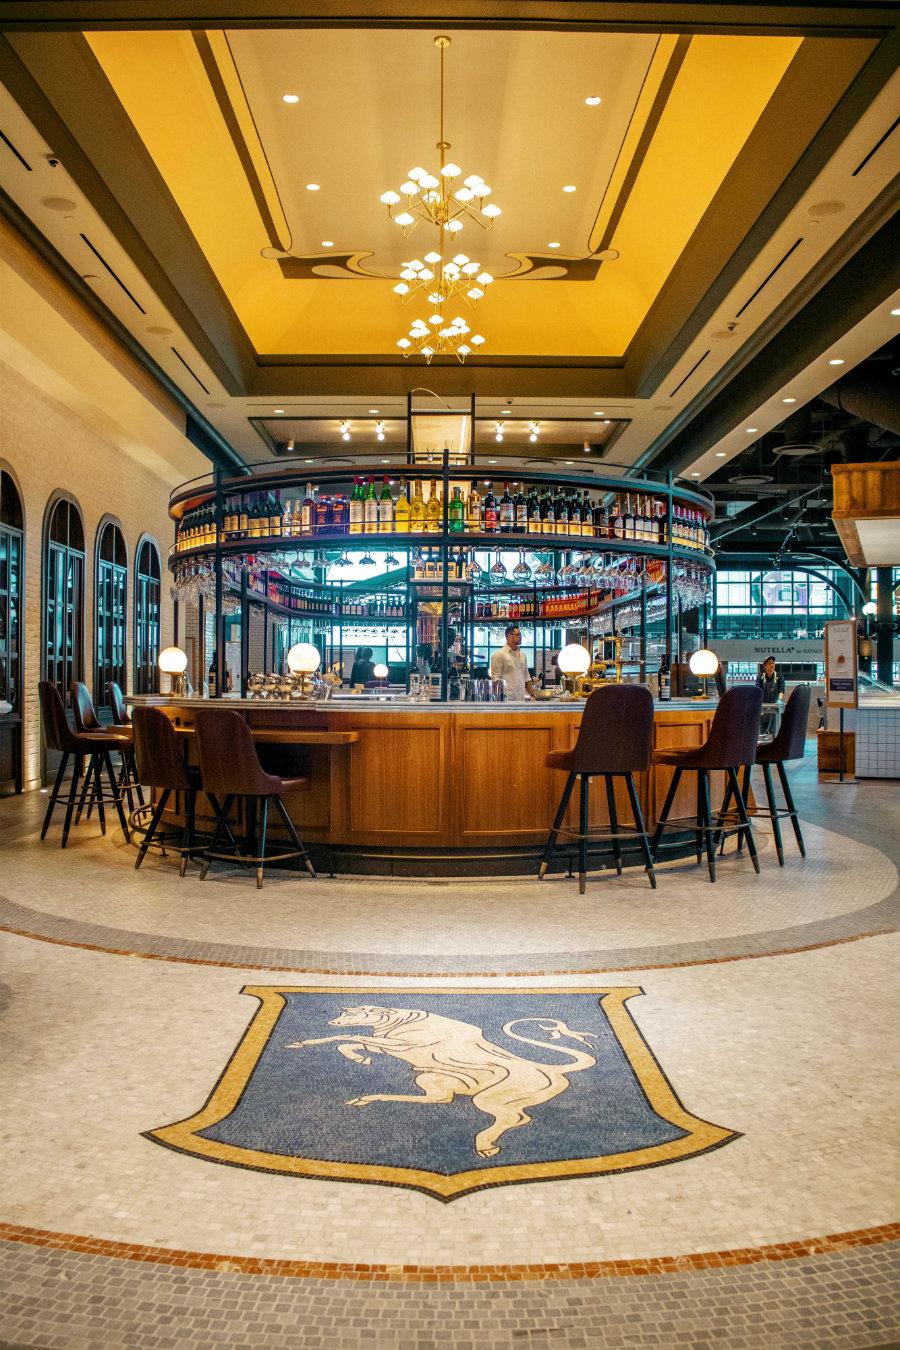 Gran Caffè Milano and the Milano mosaic bull.